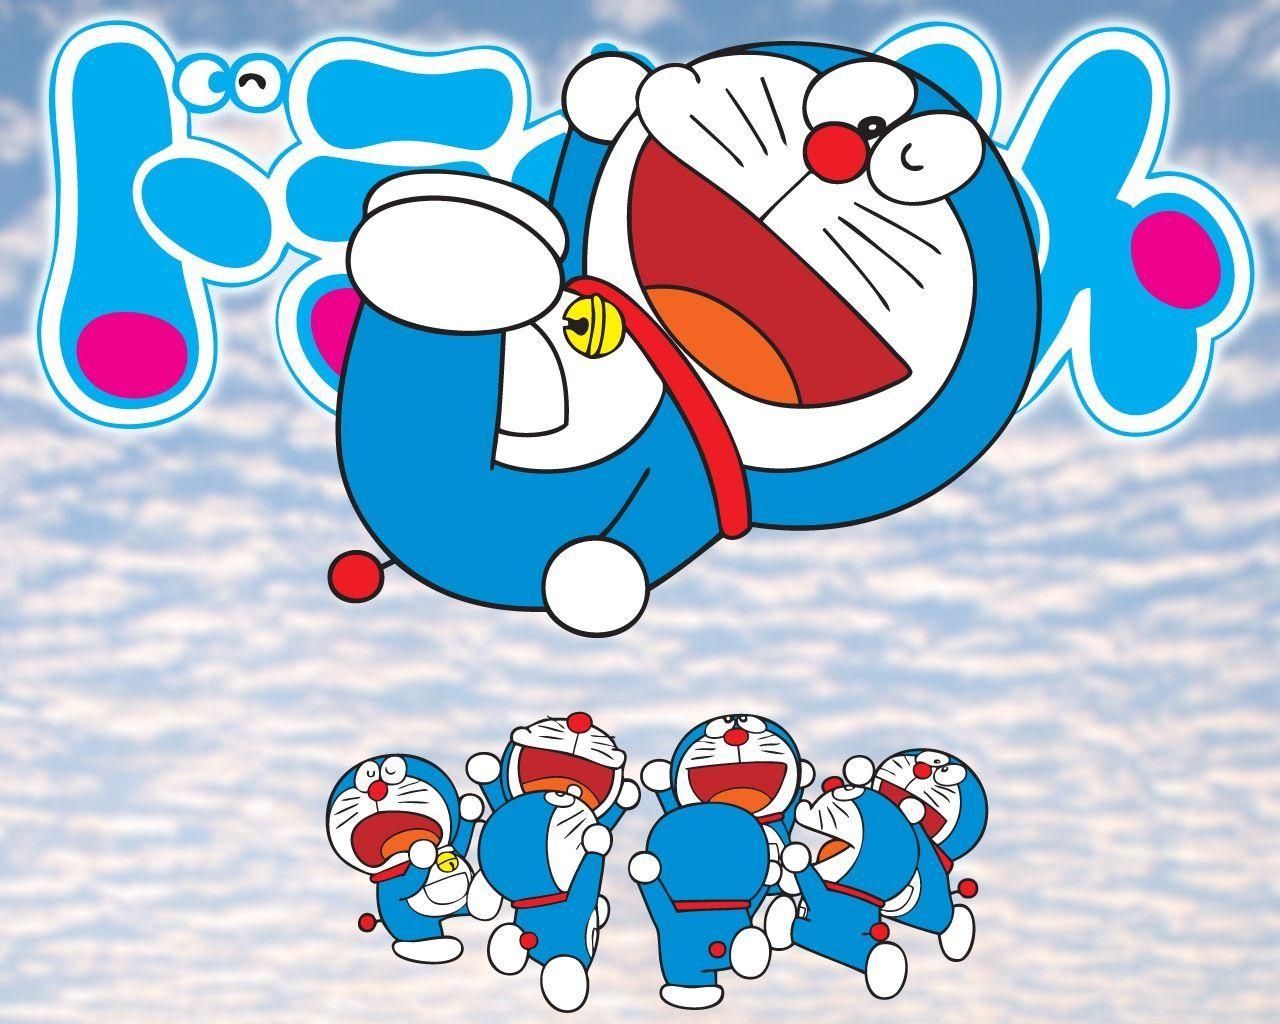 Download wallpaper doraemon free - Doraemon Wallpaper Download Free Cartoons Images Kavii Pinterest Free Cartoon Images And Wallpaper